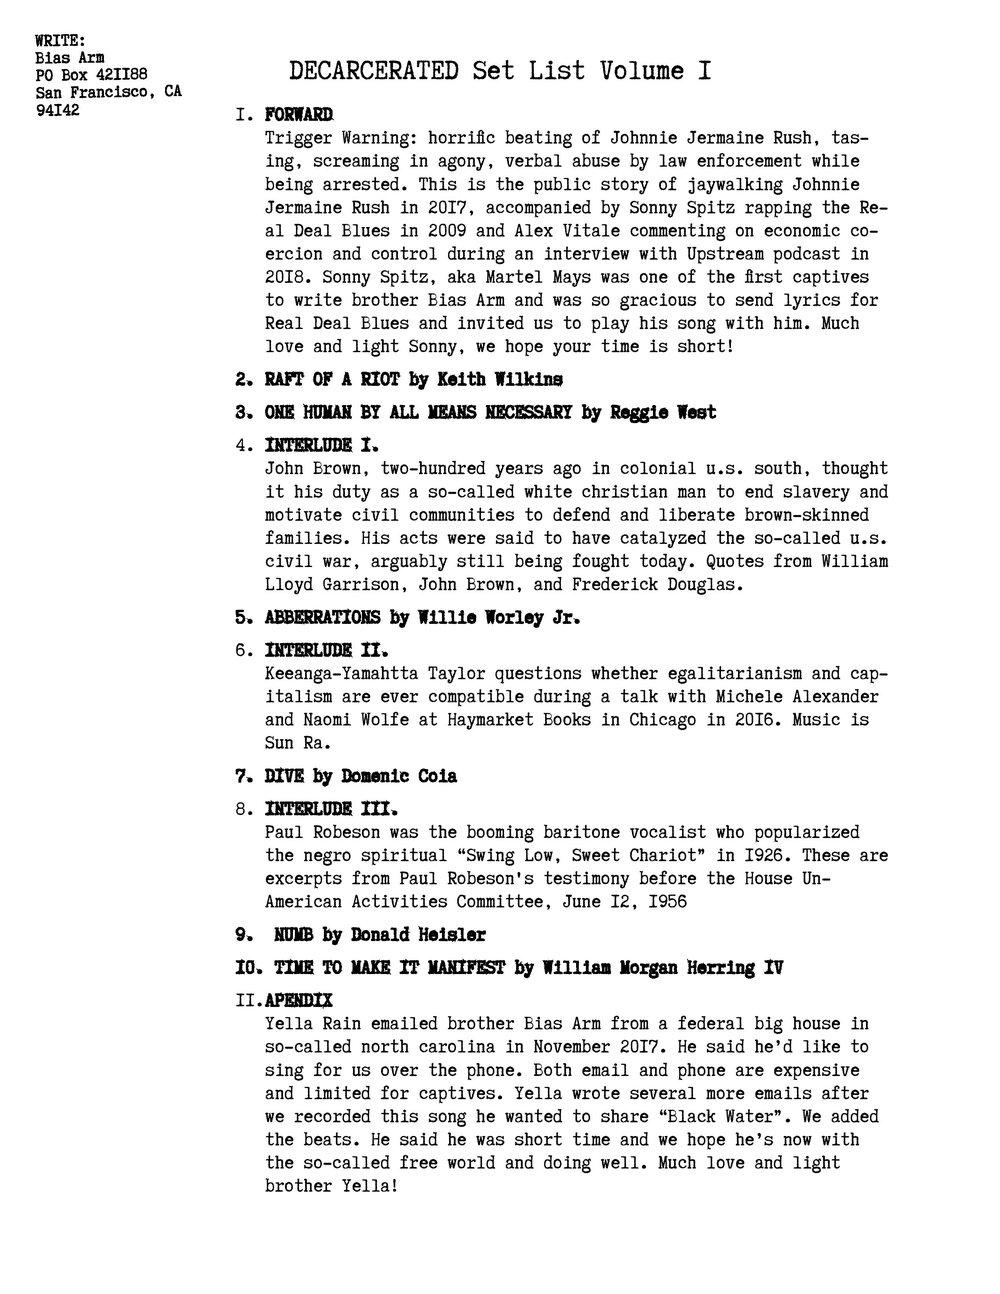 SLFH_vol_1-page-005.jpg